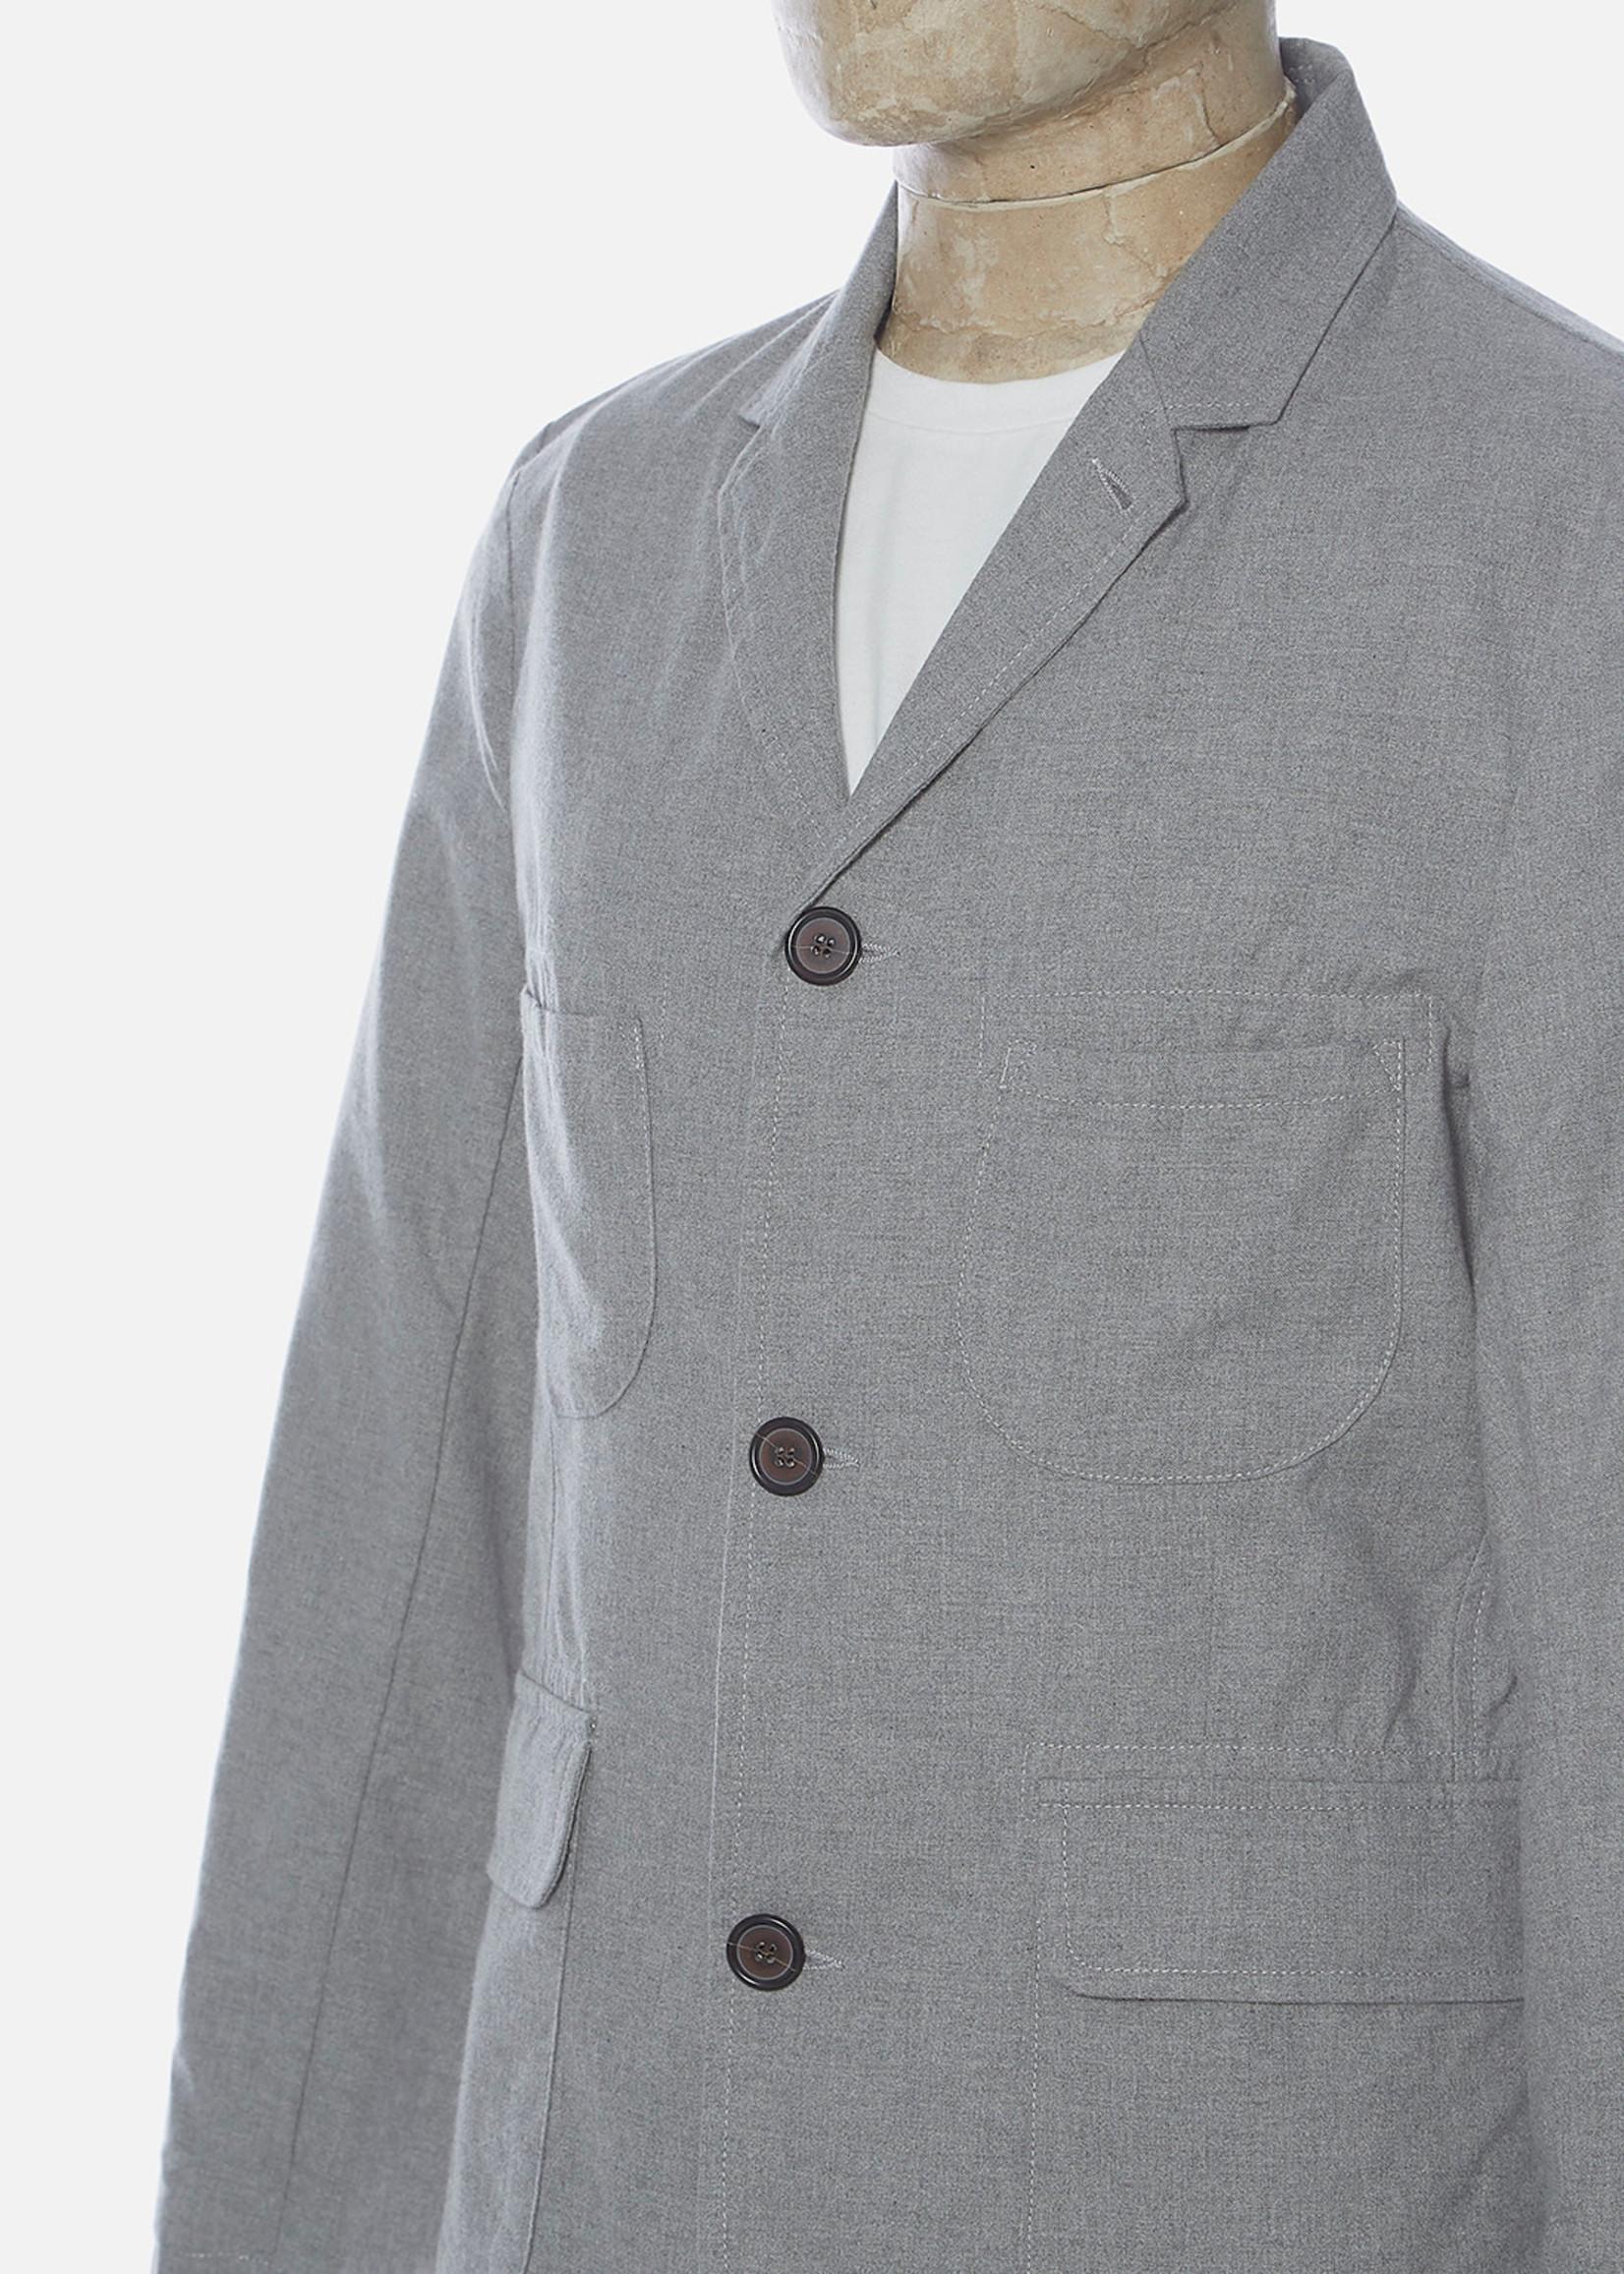 Universal Works Universal WorksBarra Jacket Grey Cotton Suiting